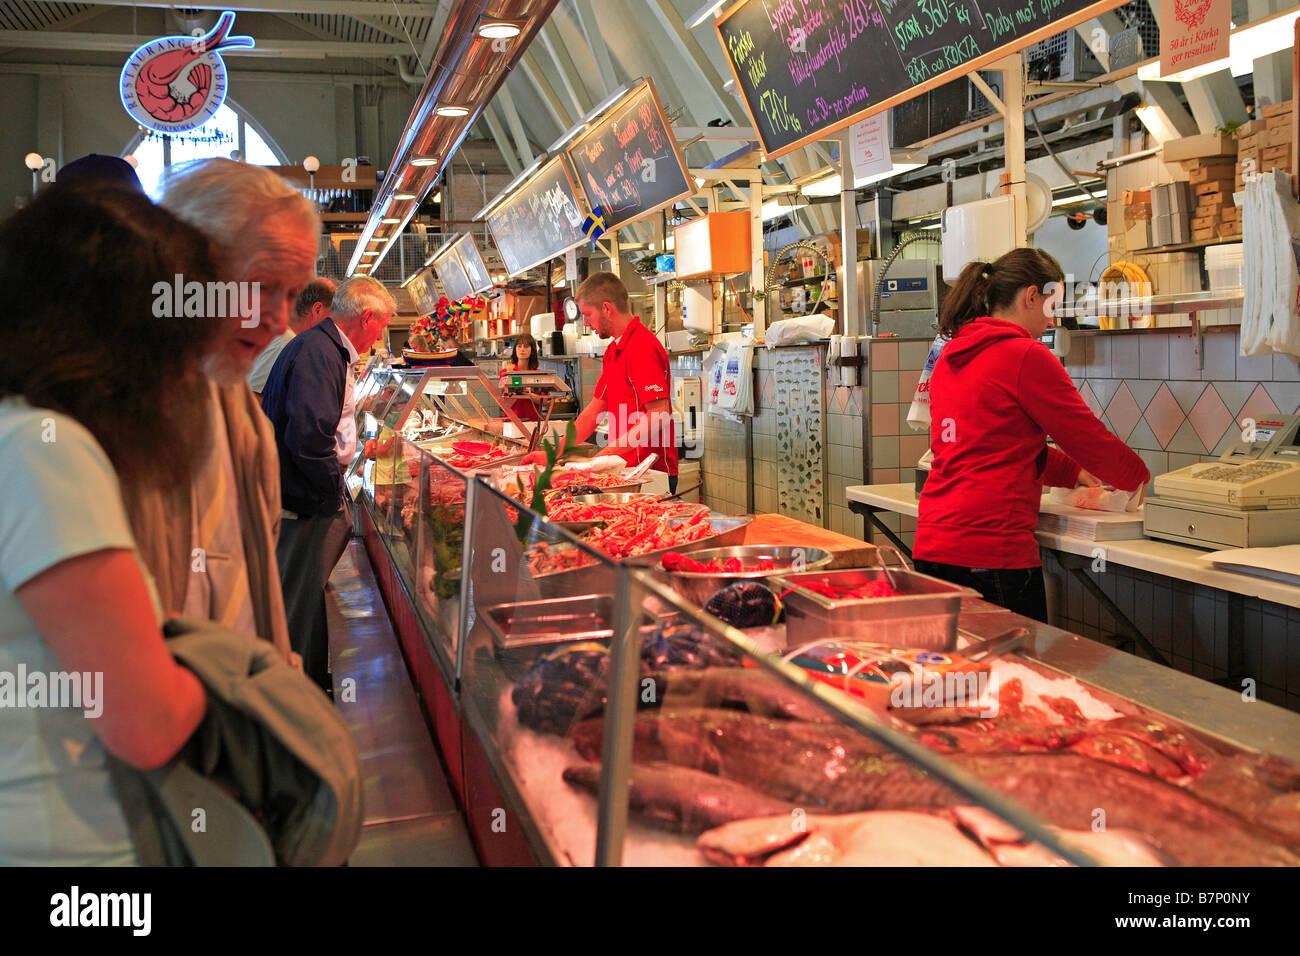 Sweden gothenburg feskekorka fish market 39 the fish for Best fish market nyc